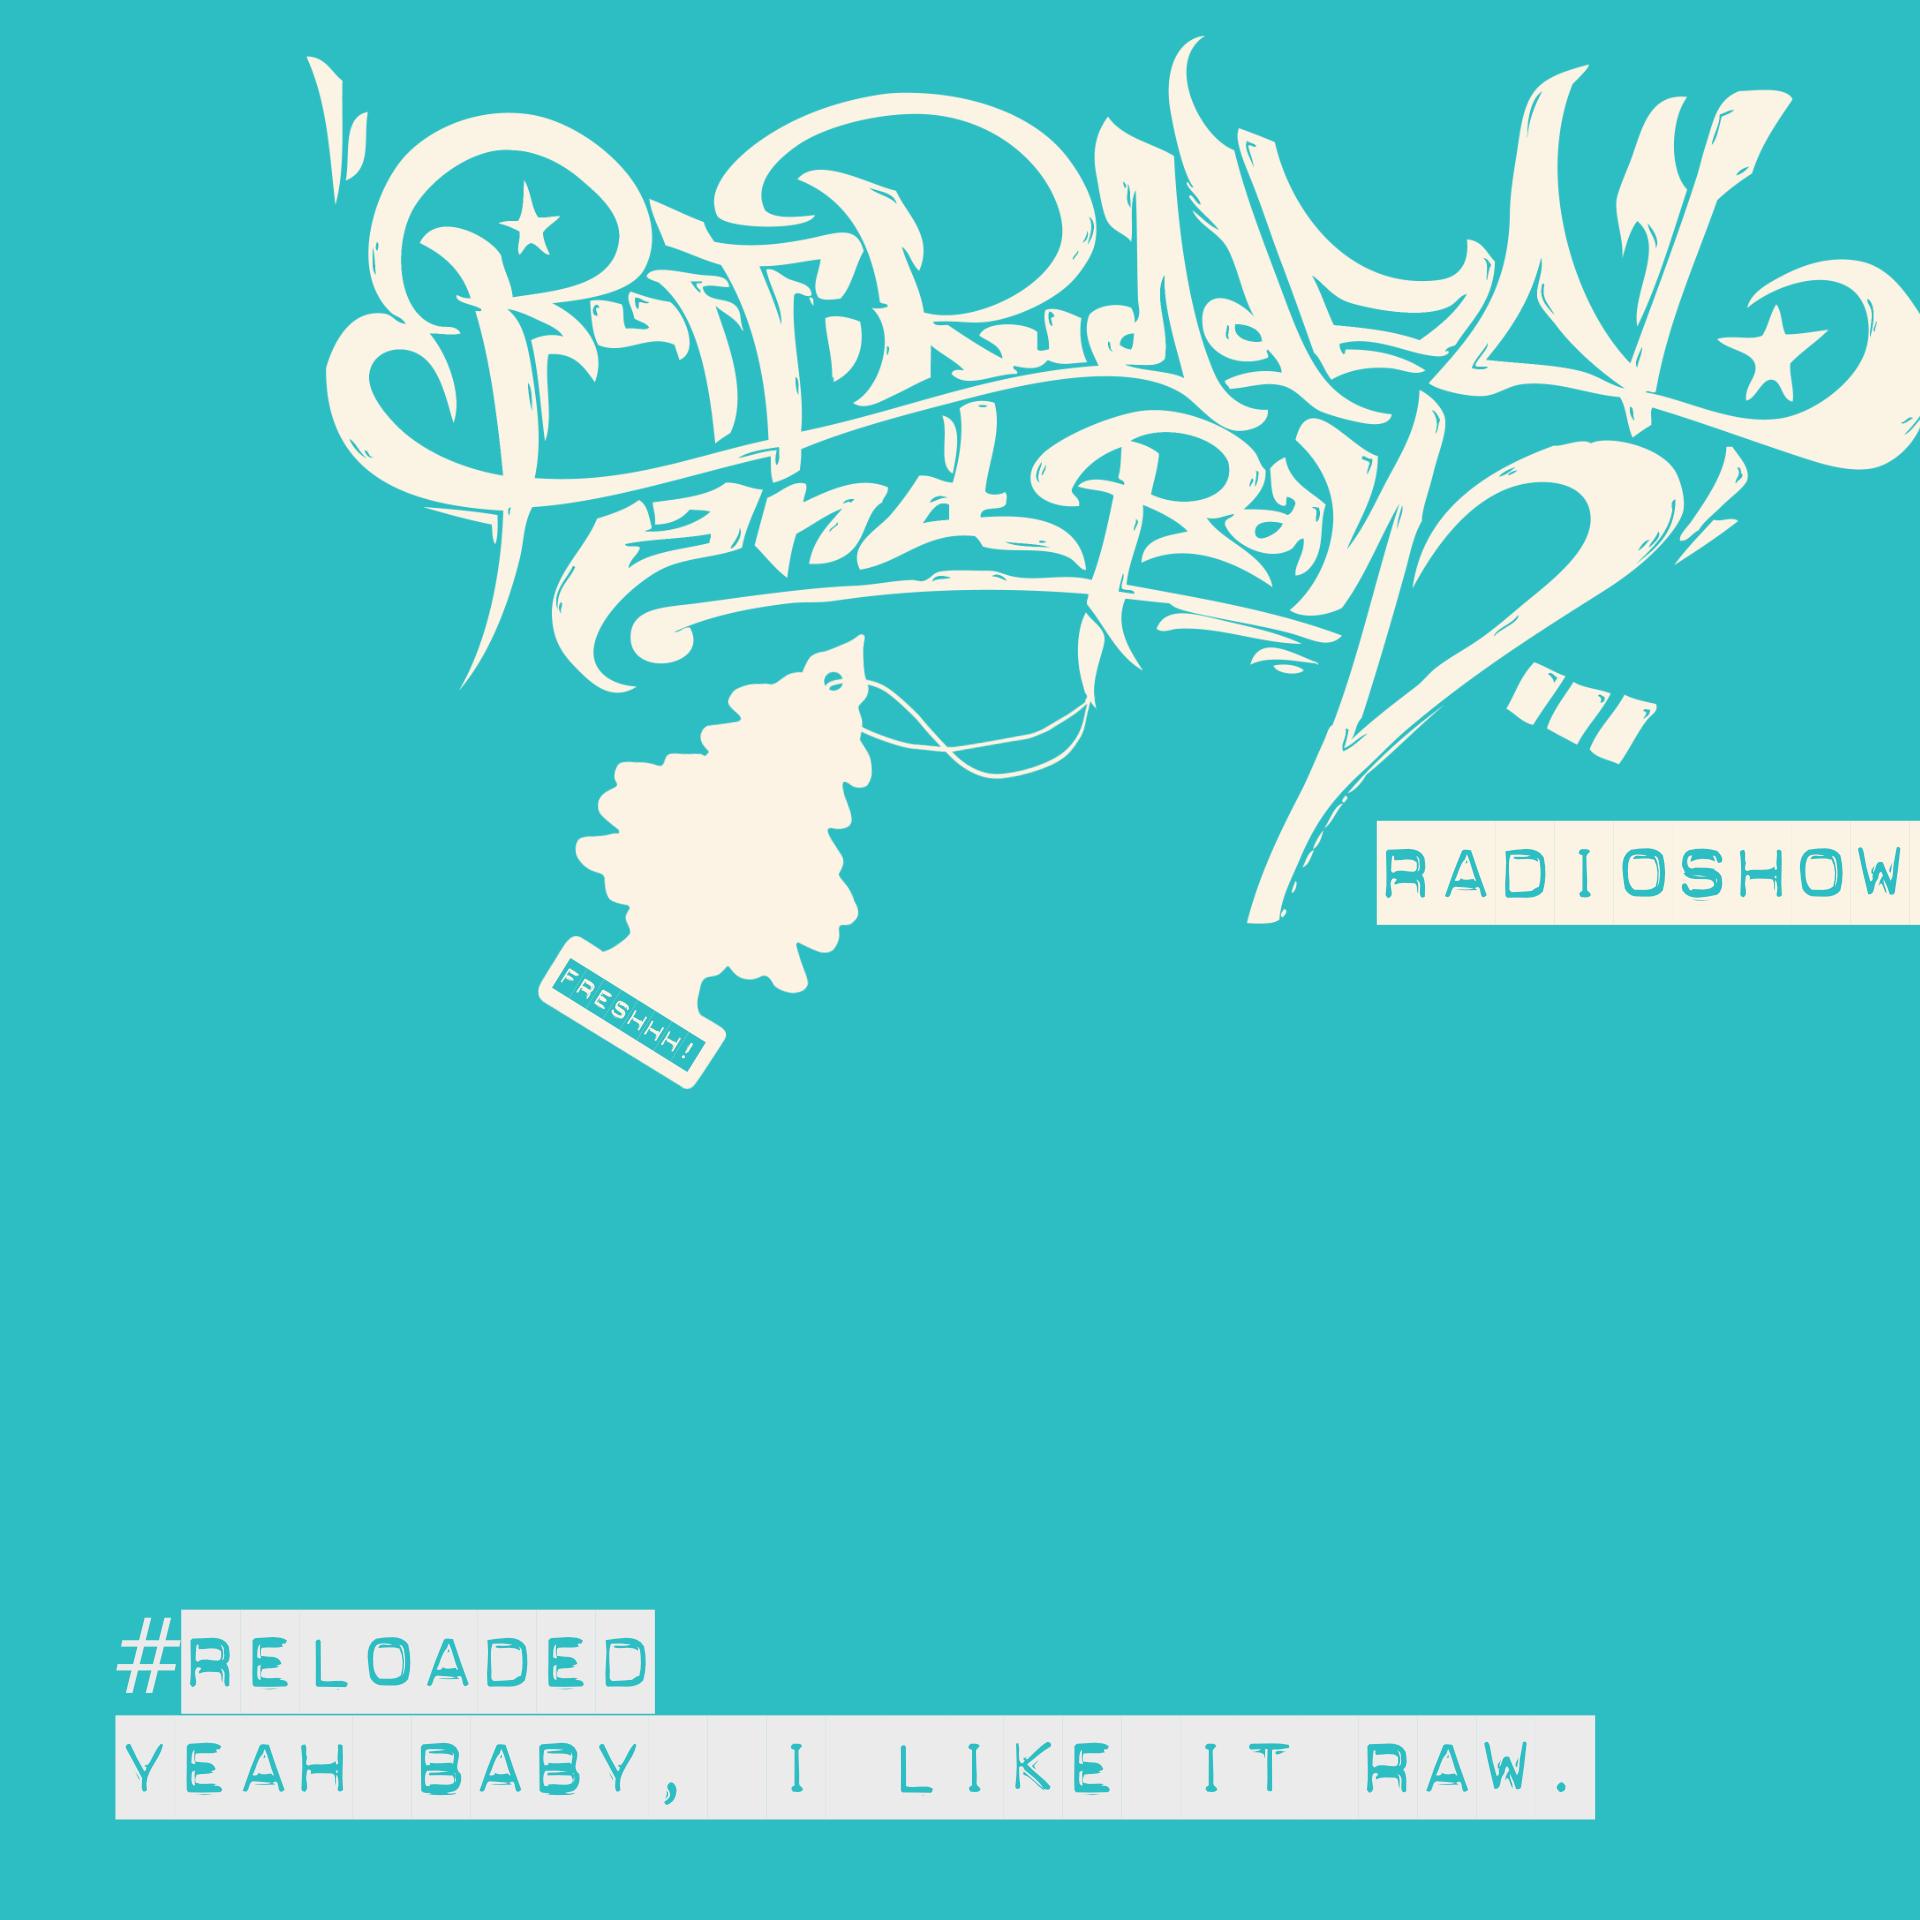 RUFF, RUGGED & RAW Radioshow (Banner)